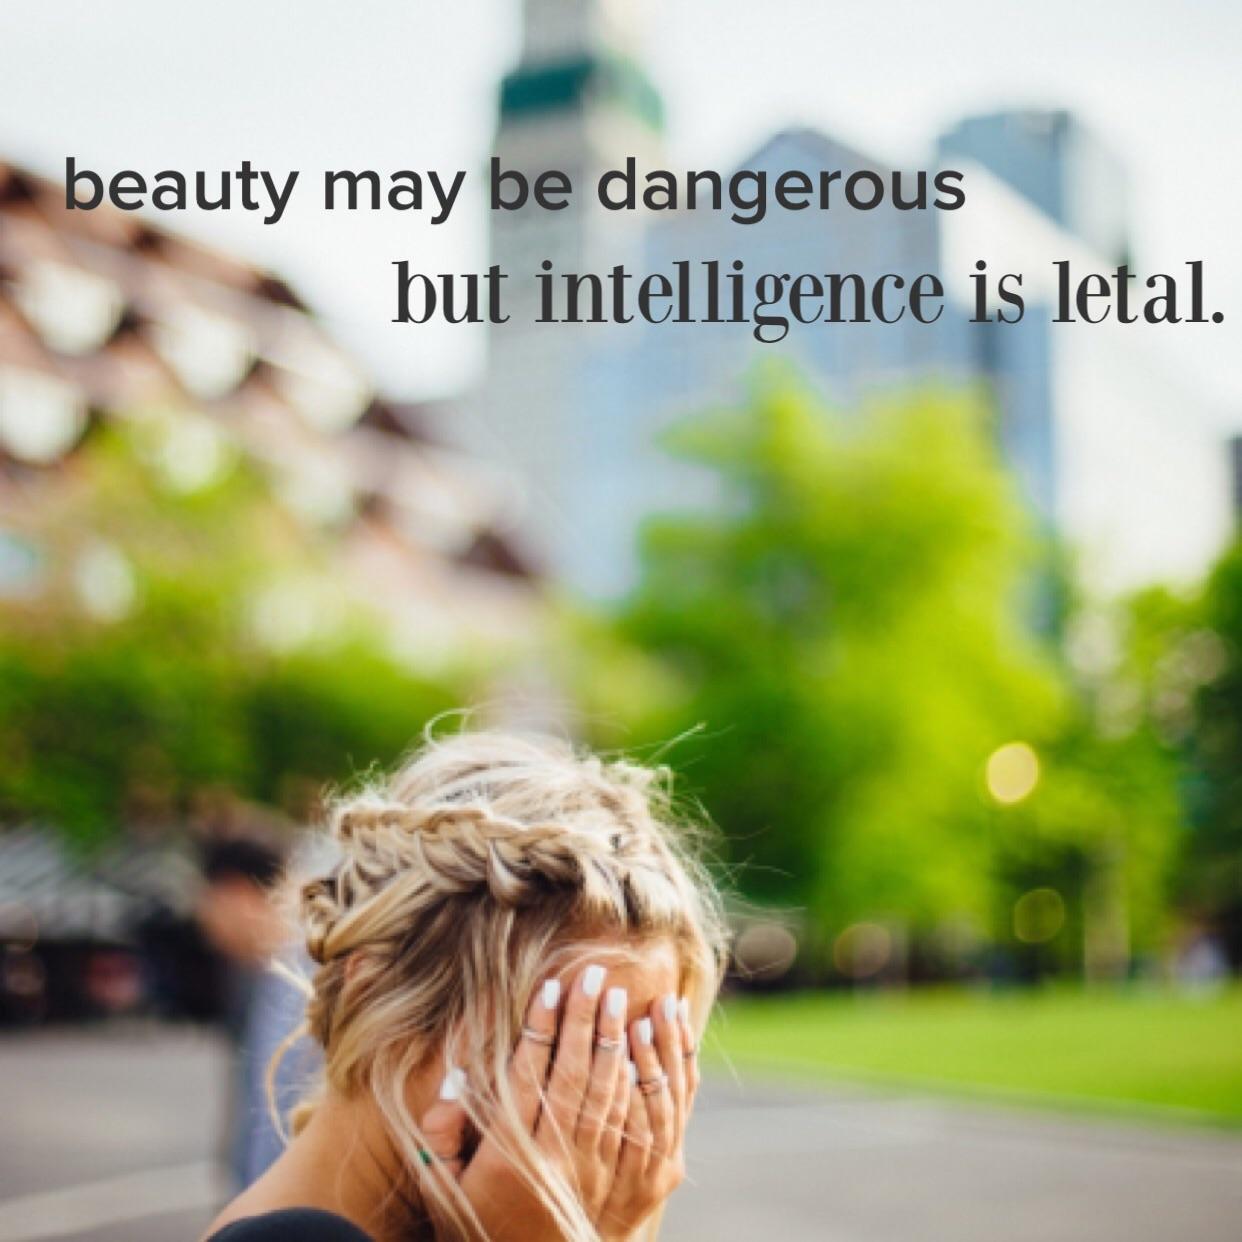 From Abigail Keenan (abigailkeenan.com)